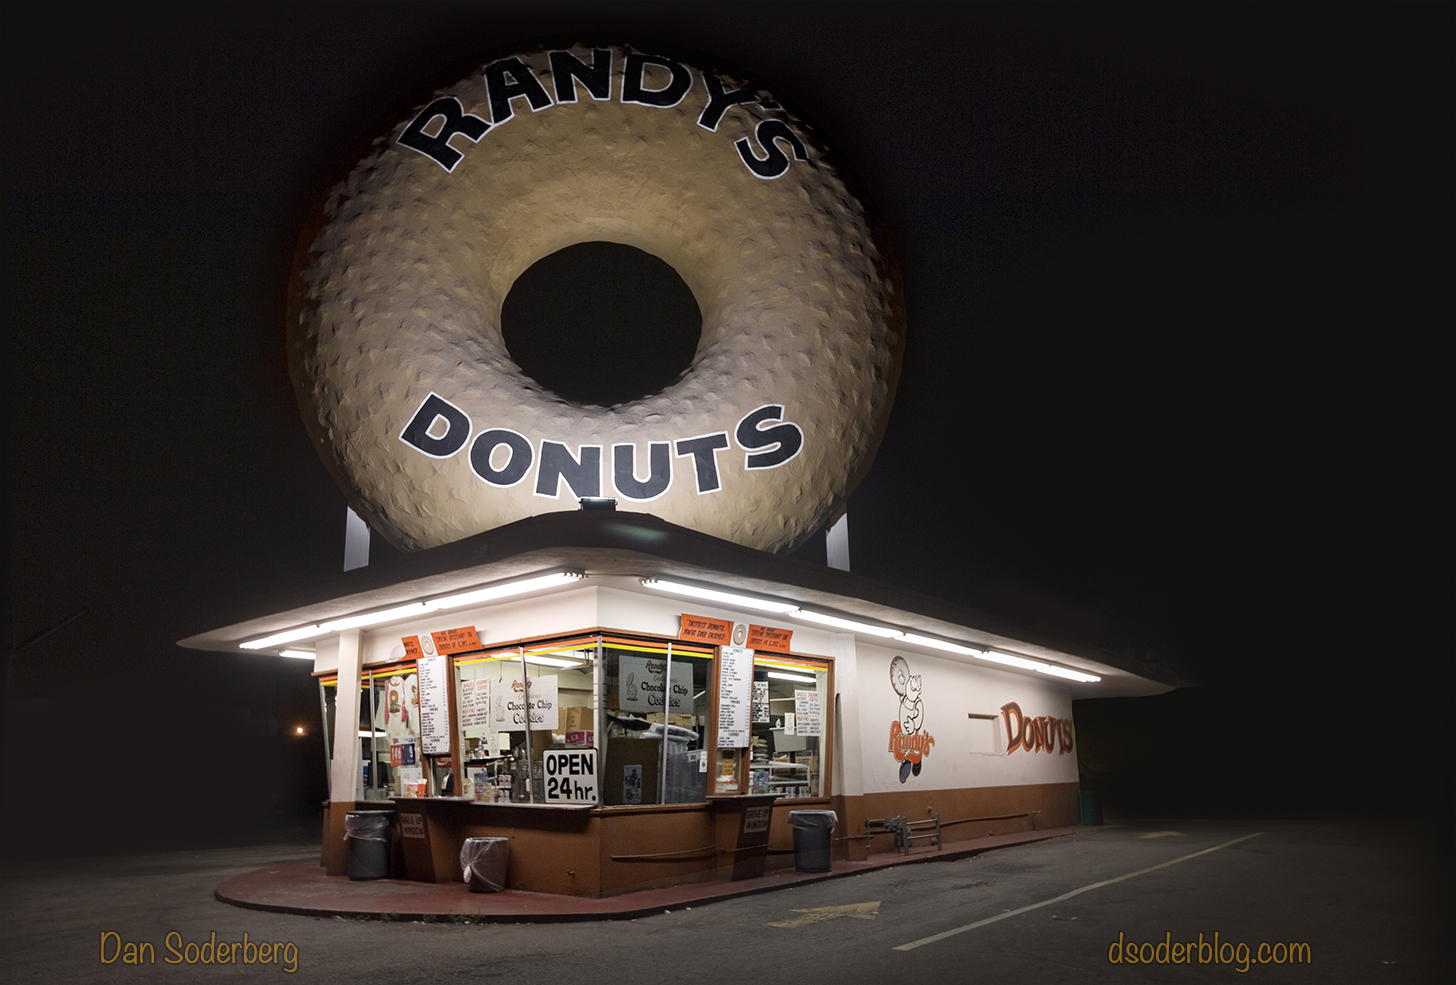 randys-donuts-8_13_09_dsc0311alt